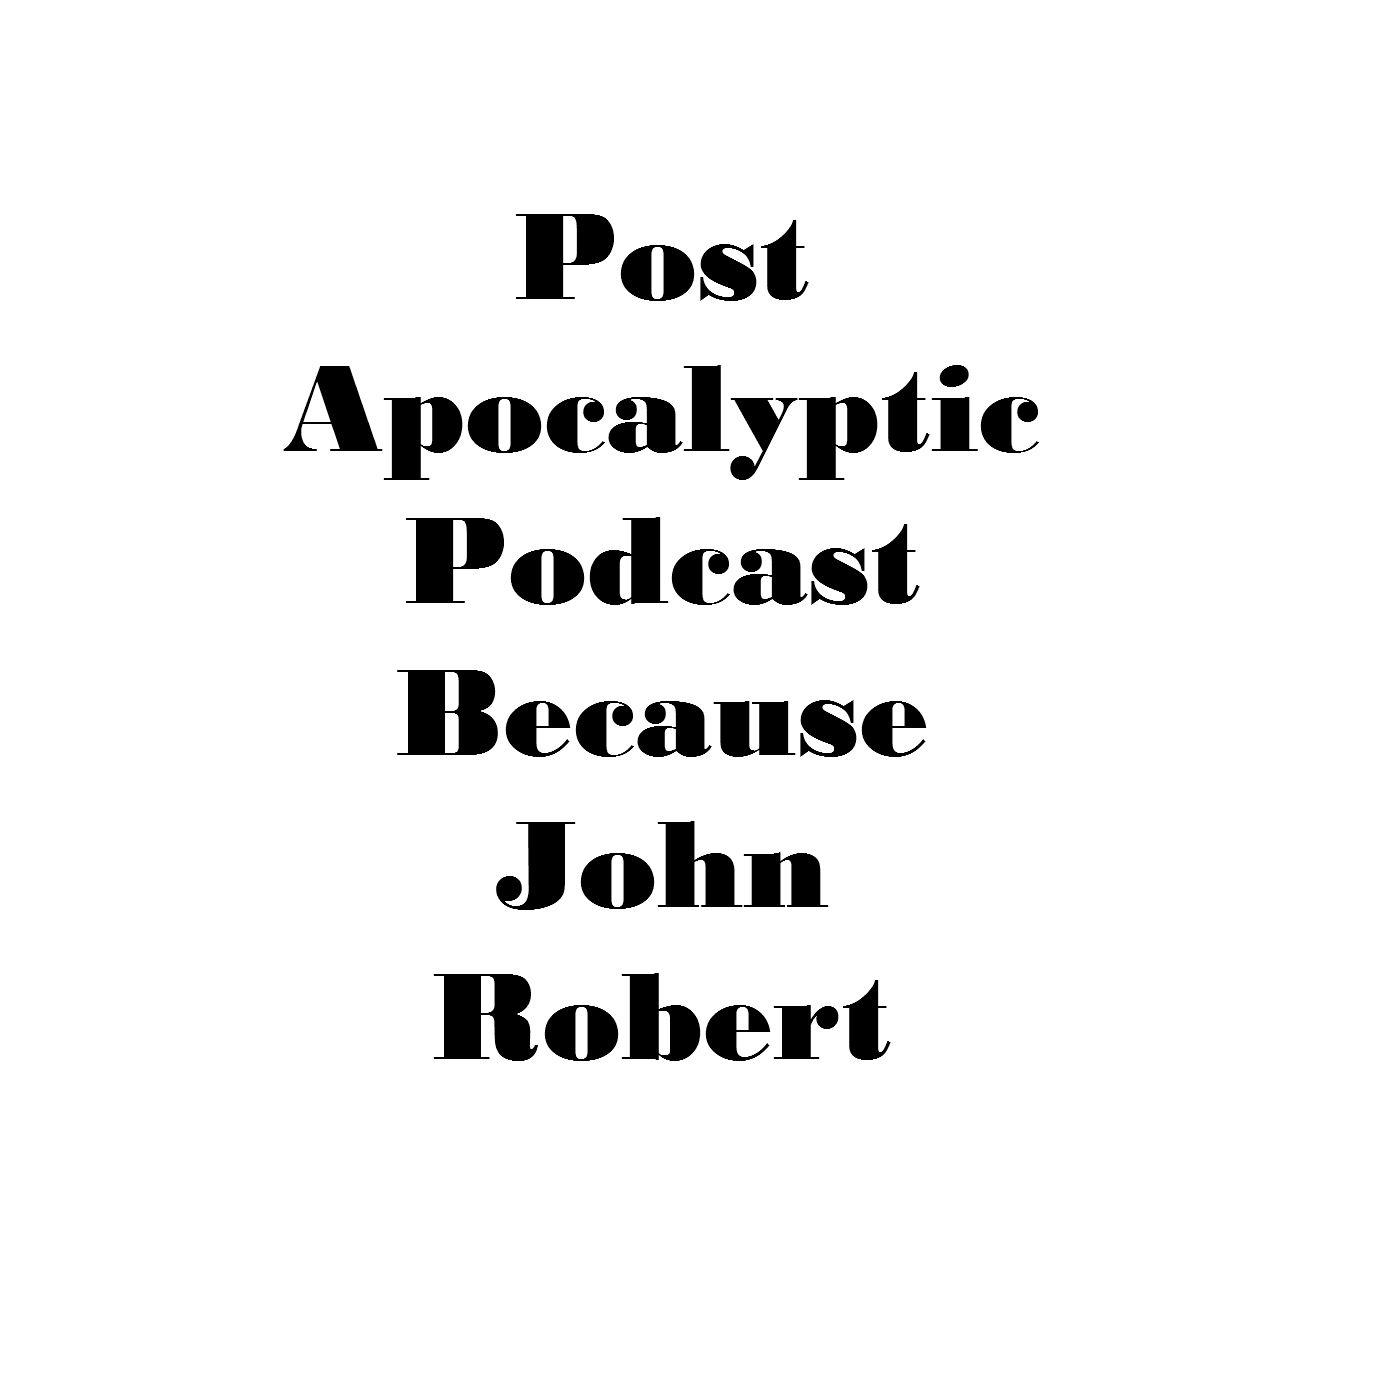 Post Apocalyptic Podcast (podcast)